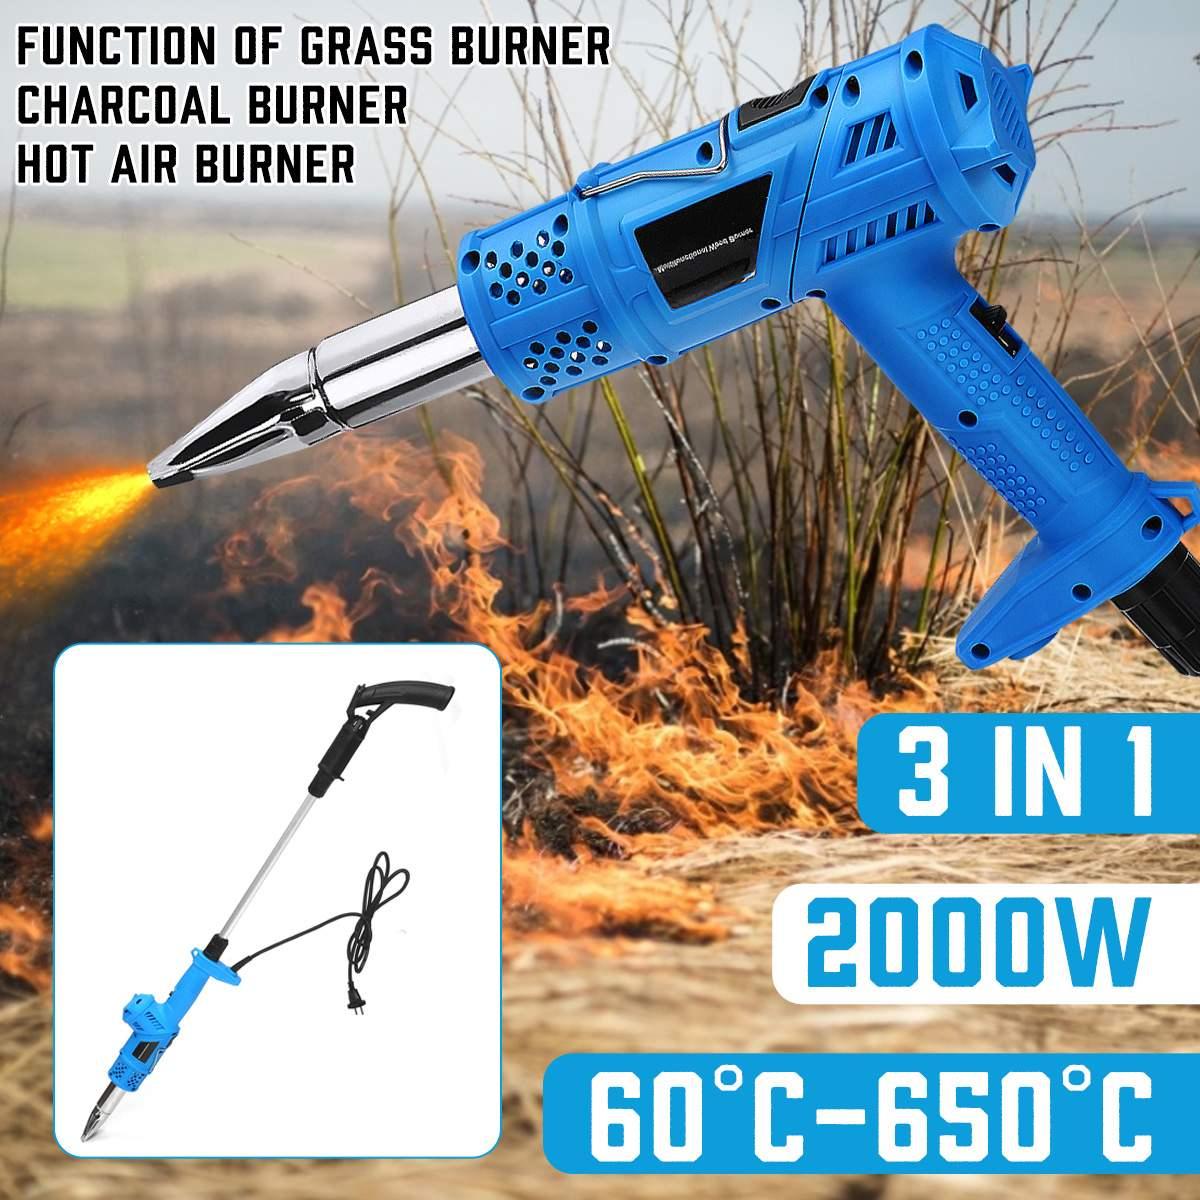 3-in-1 Electric Lawnmower Weeder 2000W Power Garden Tools Weeds Burner Professional Weeding High Efficiency Detachable Handle